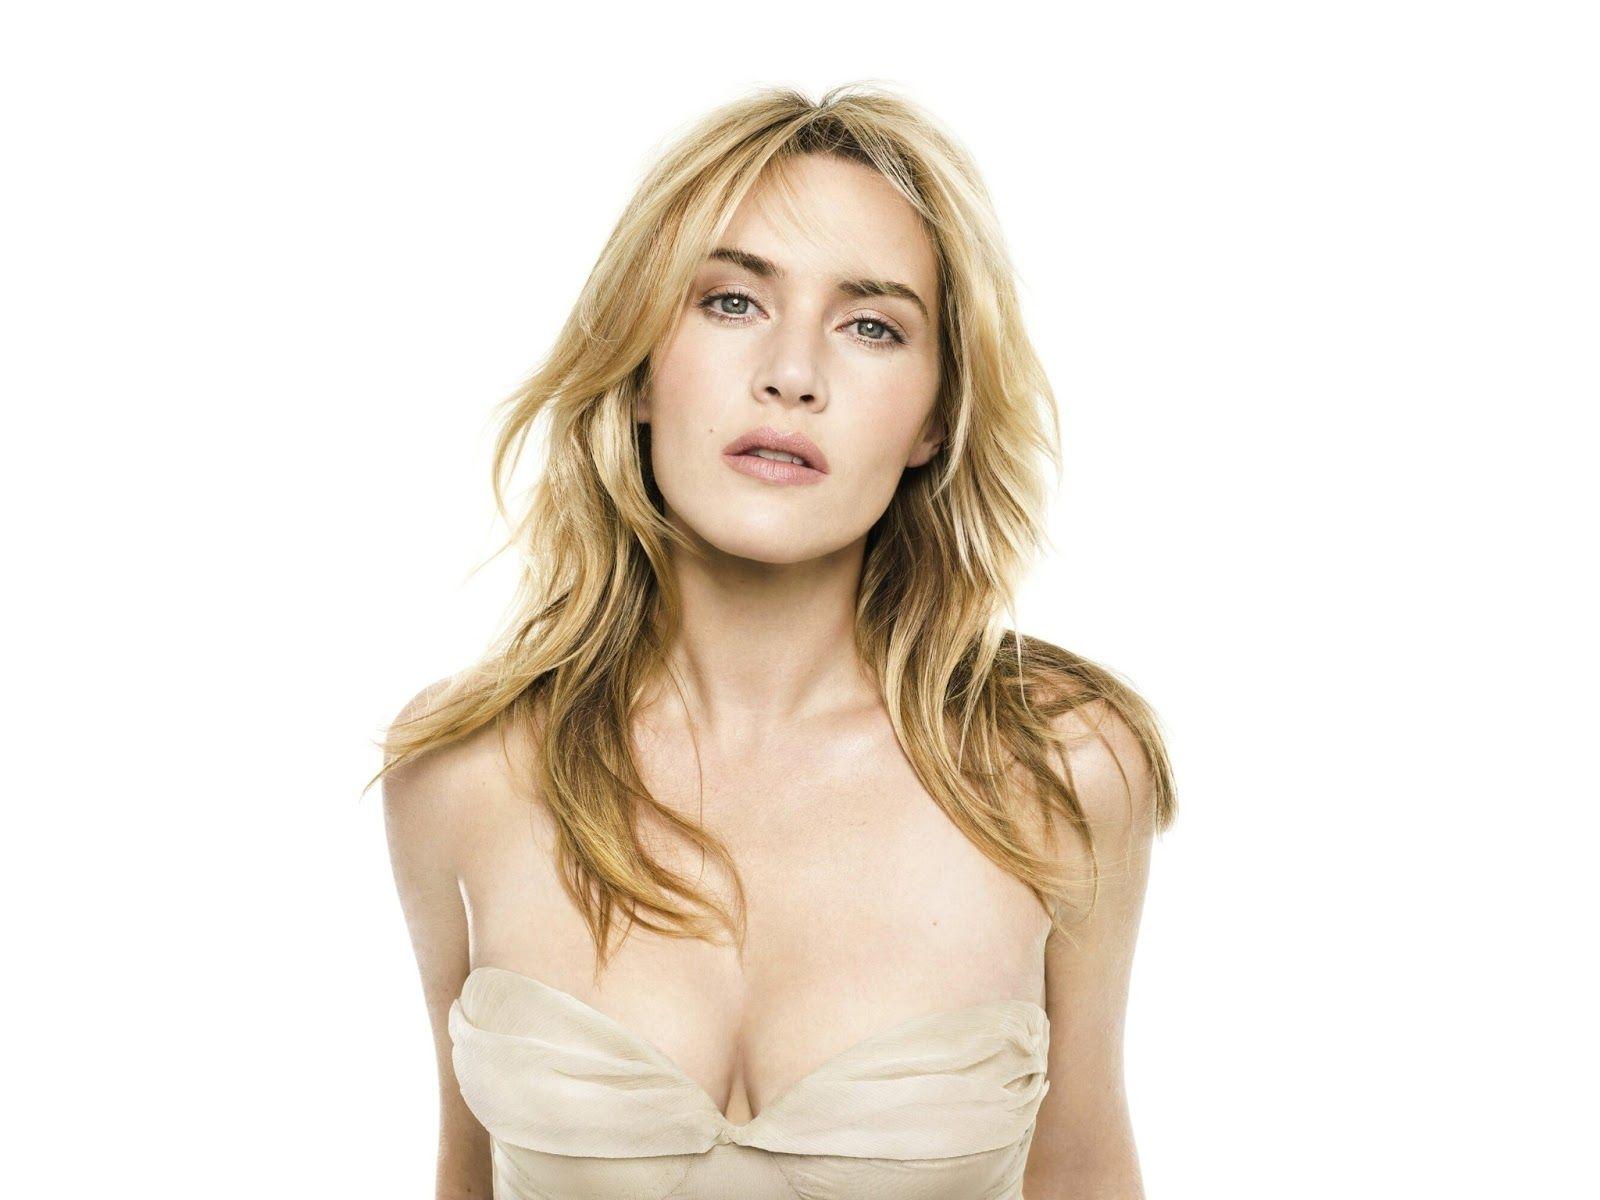 Amber coney hot boobs